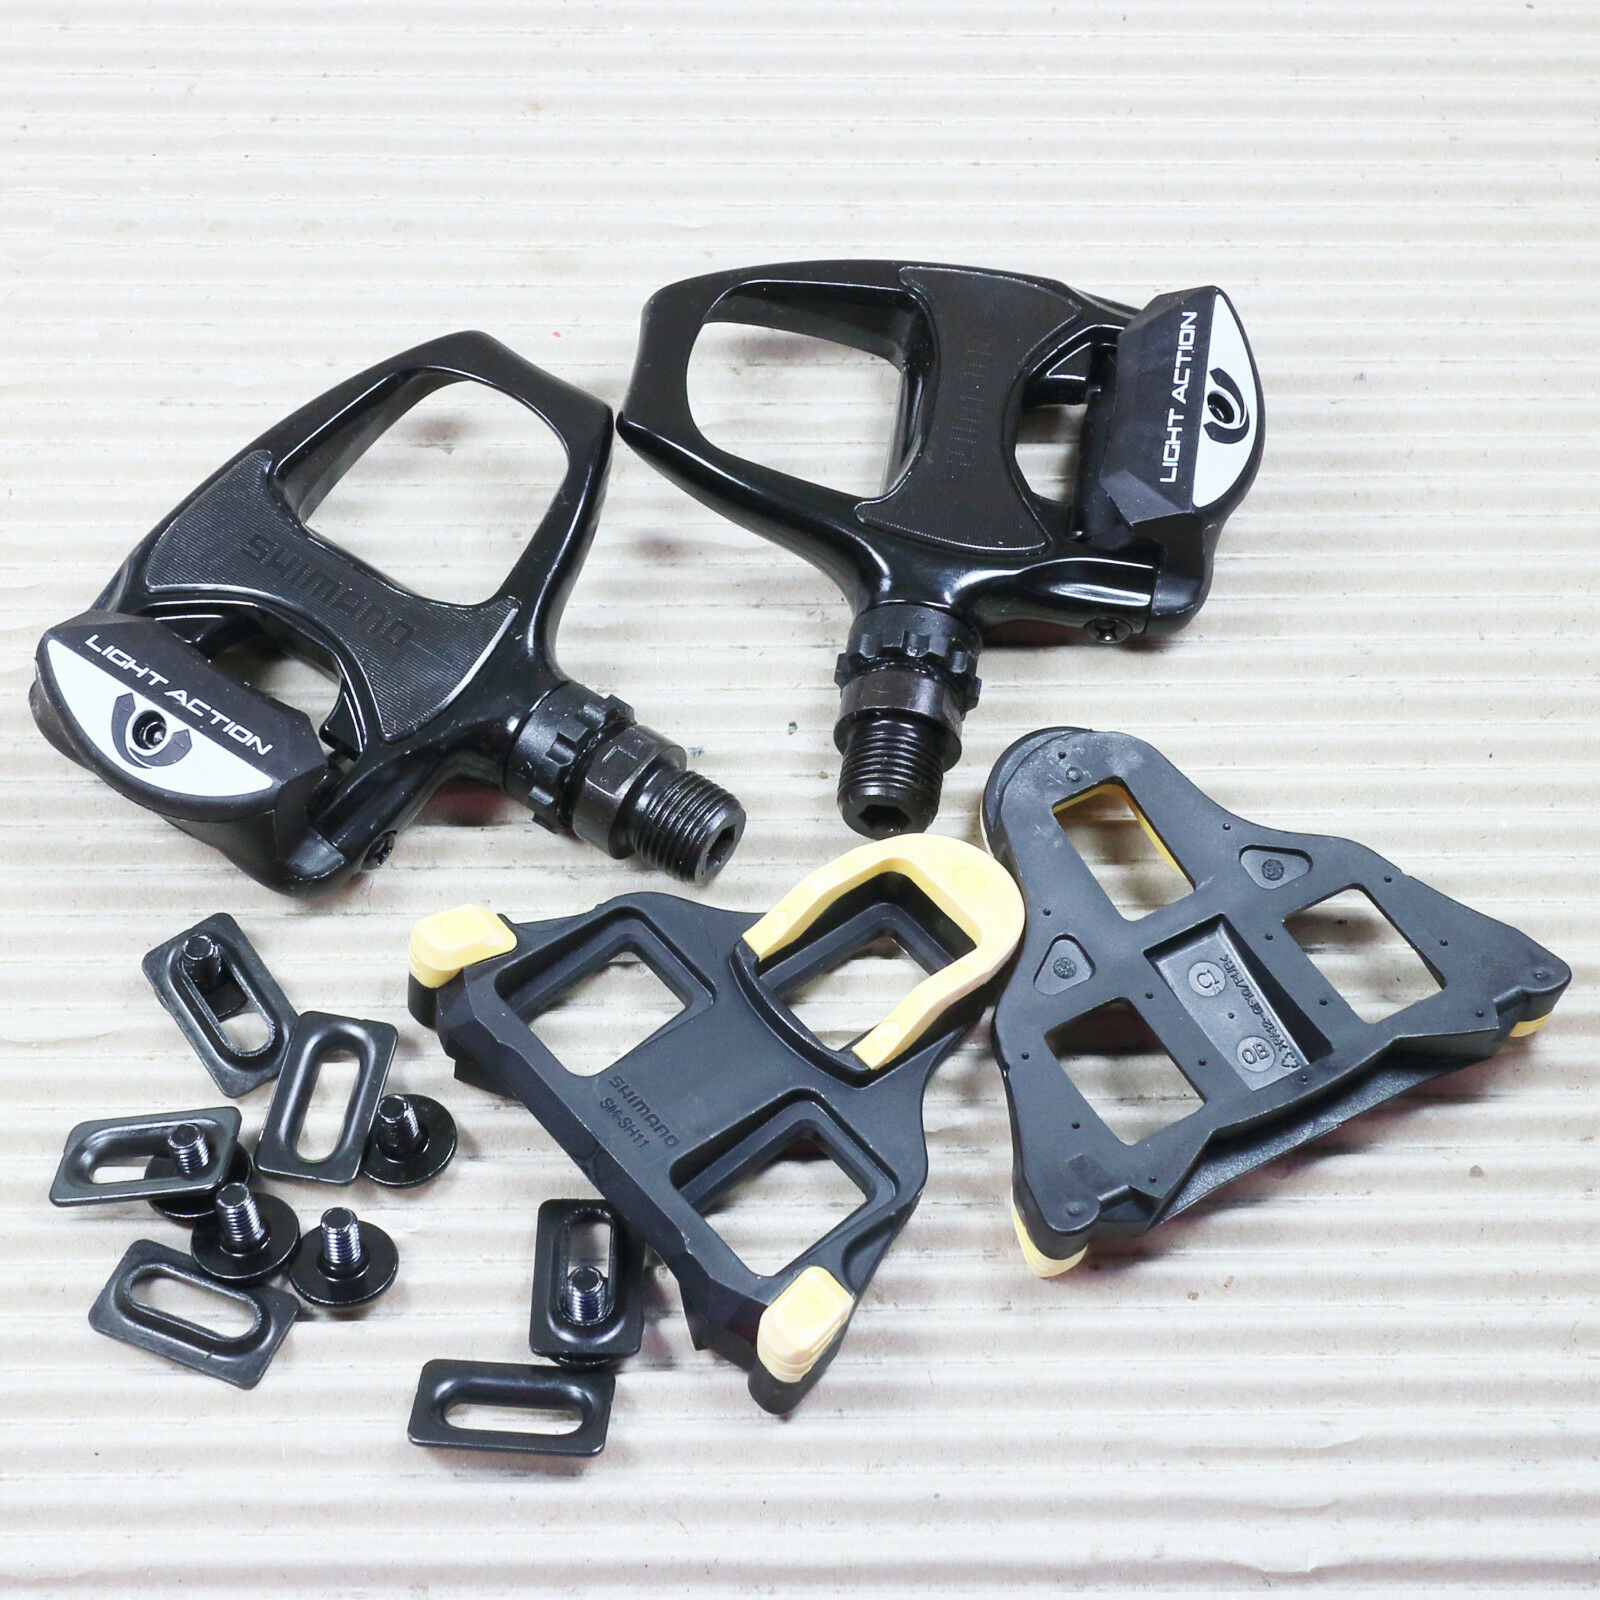 Shimano SPD-SL Pedal Pedal Pedal Rennpedal PD-R540 LA einseitig schwarz 9 16  ohne Reflektor 062660